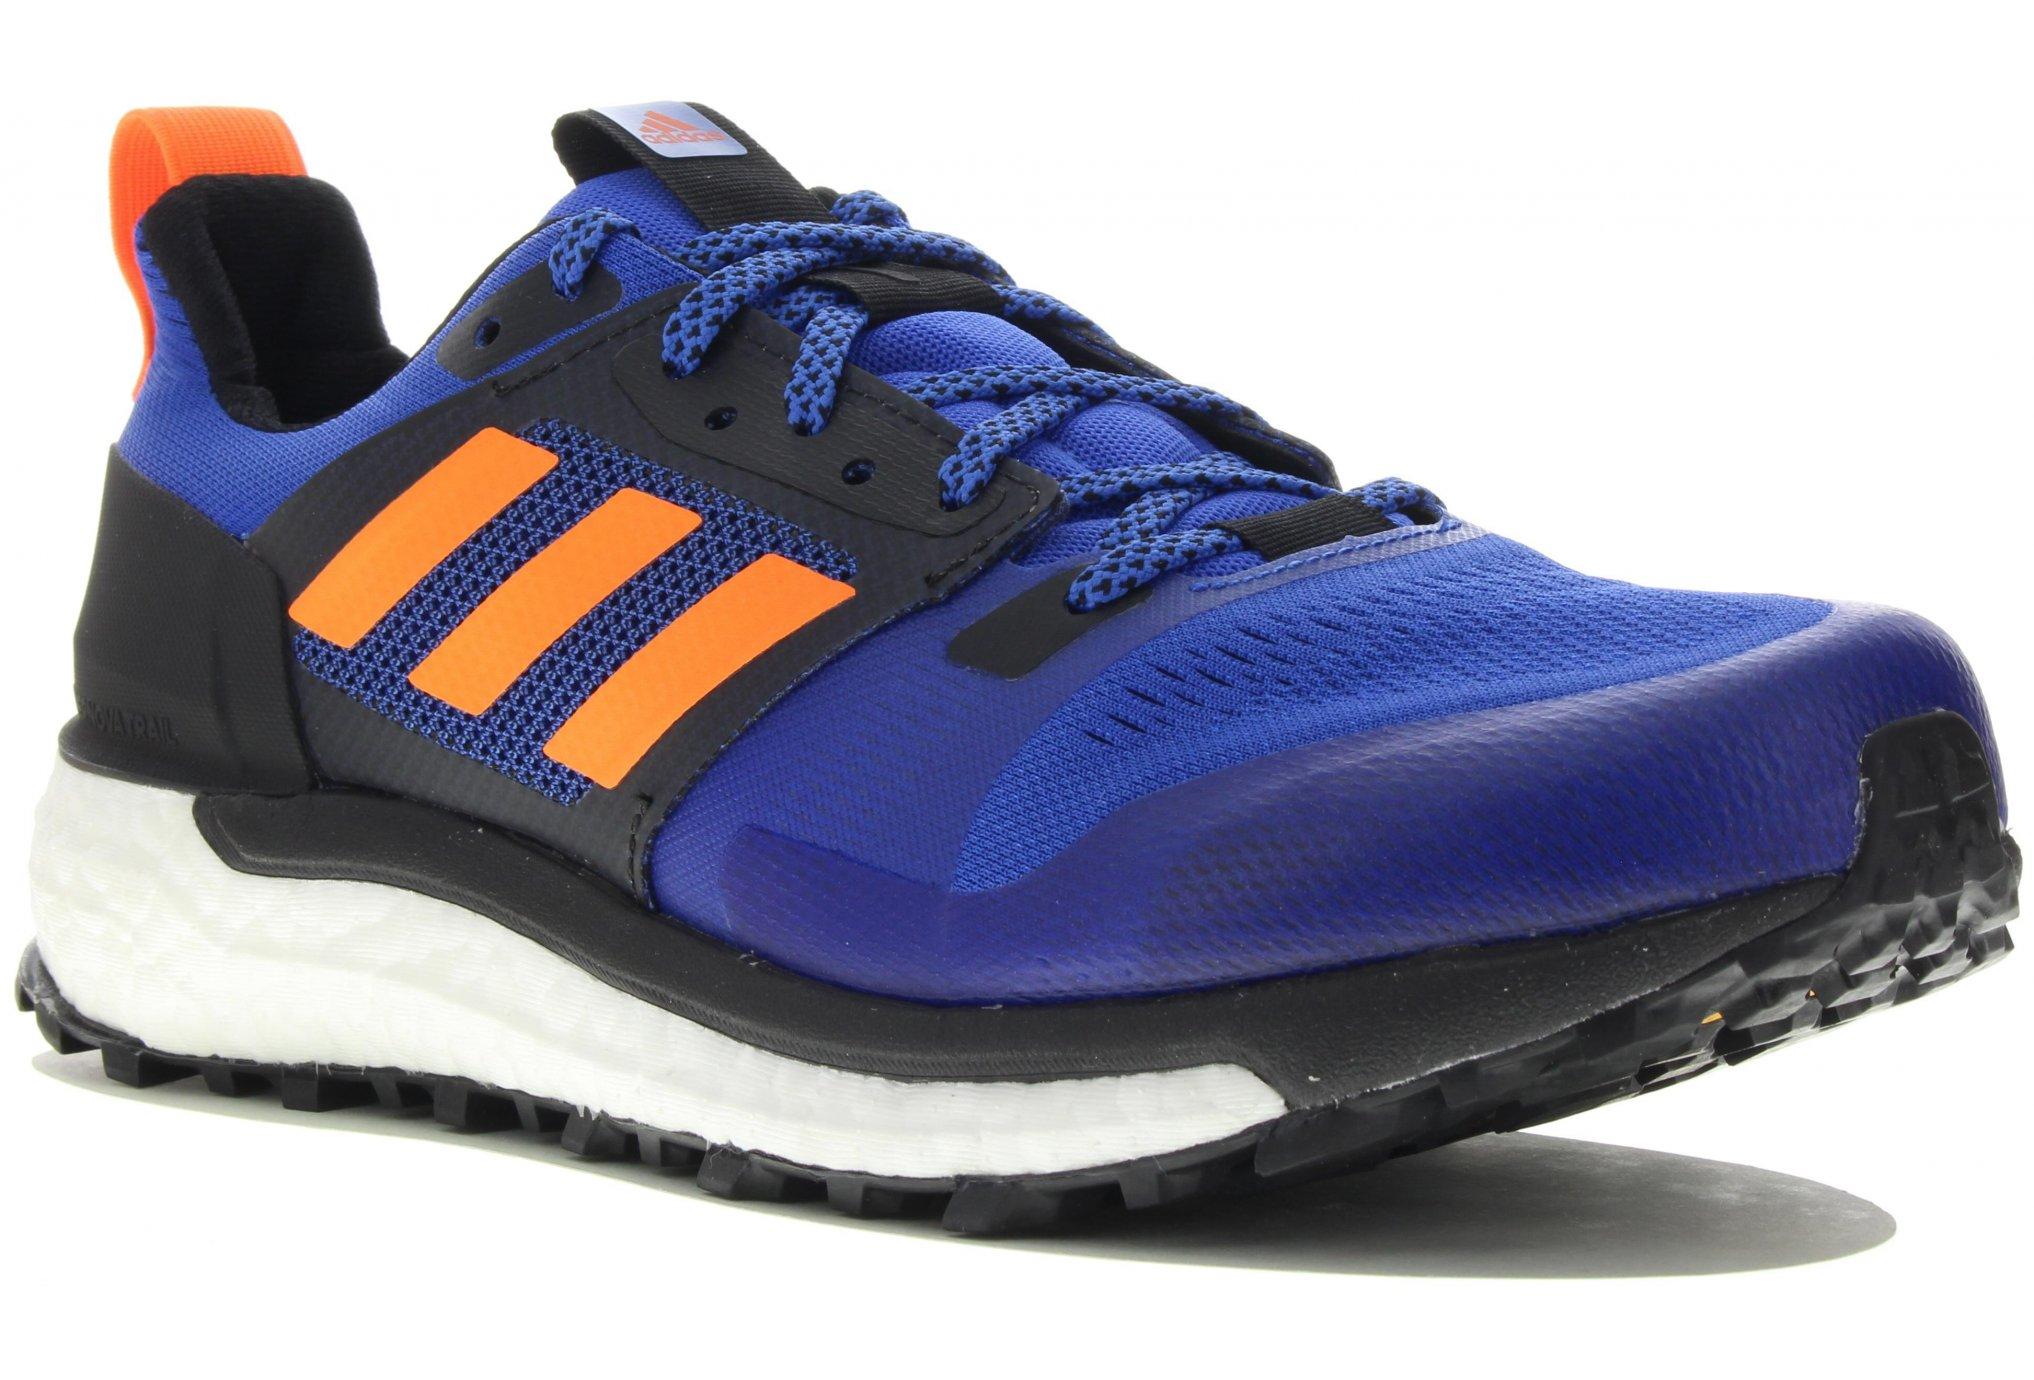 adidas Supernova Trail Chaussures homme